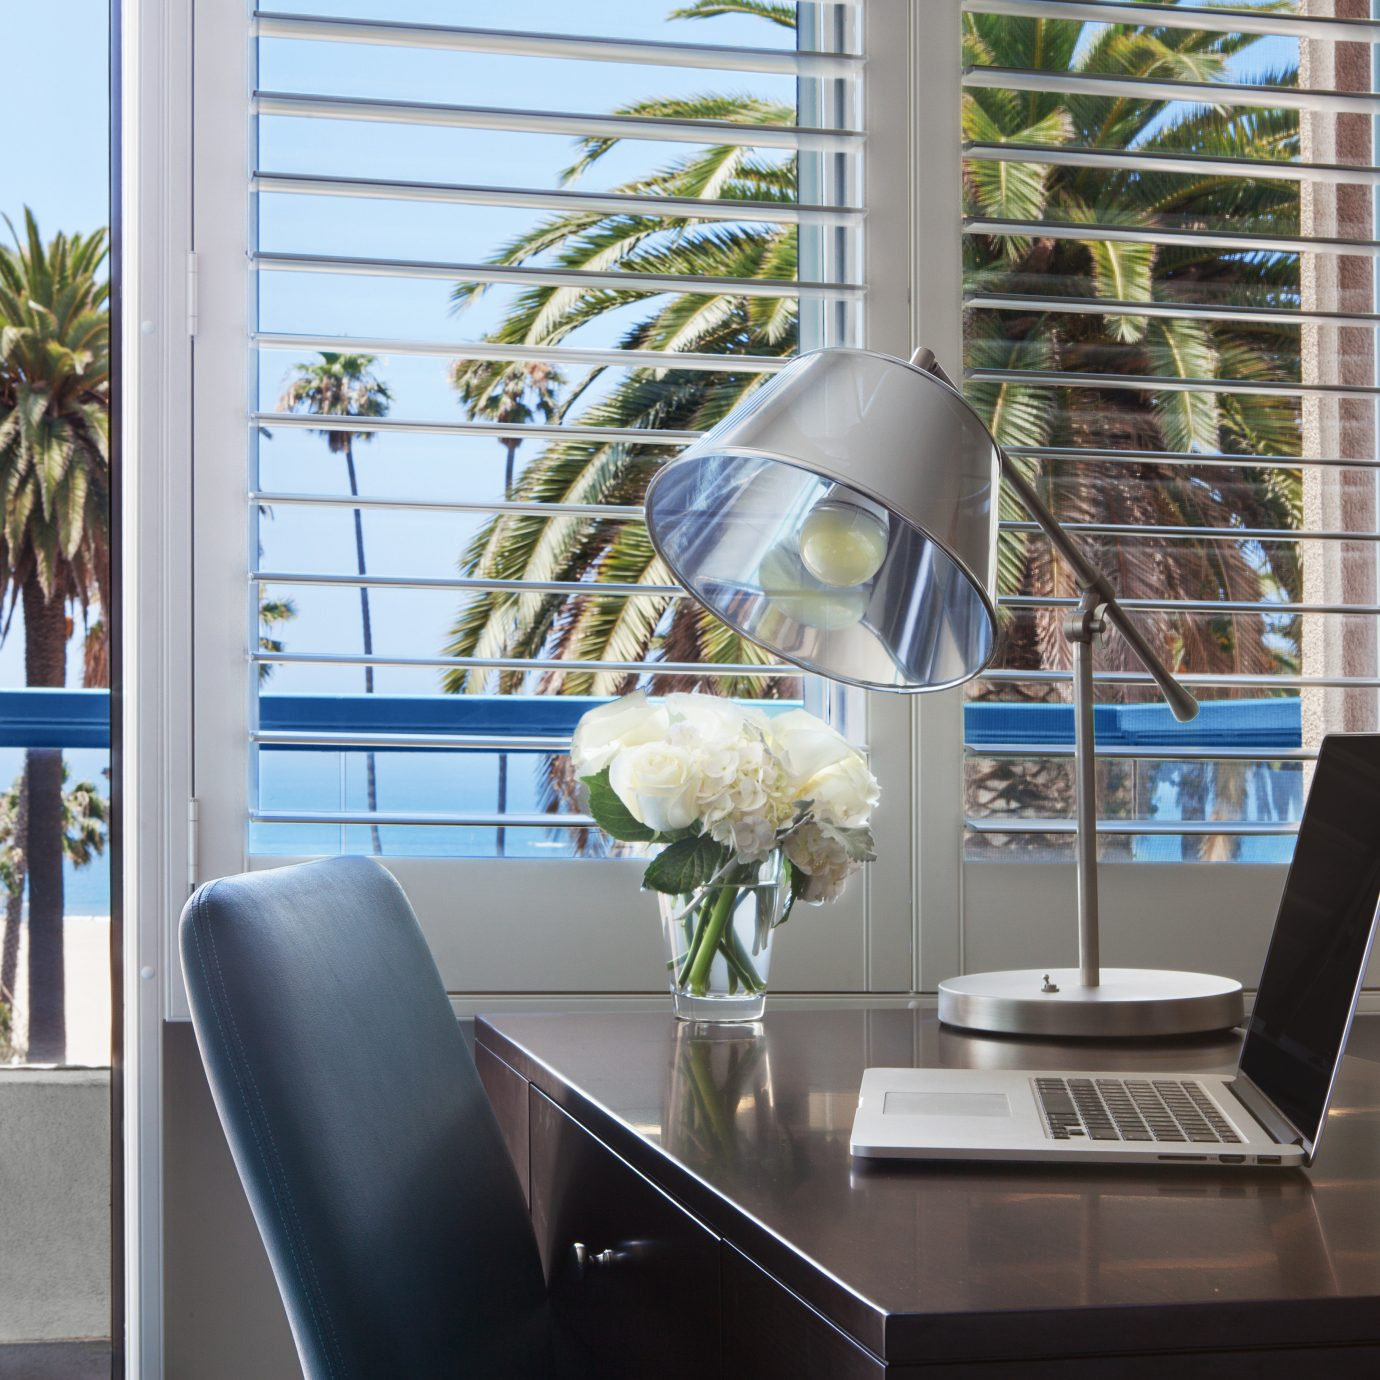 Balcony Classic property home condominium living room dining table